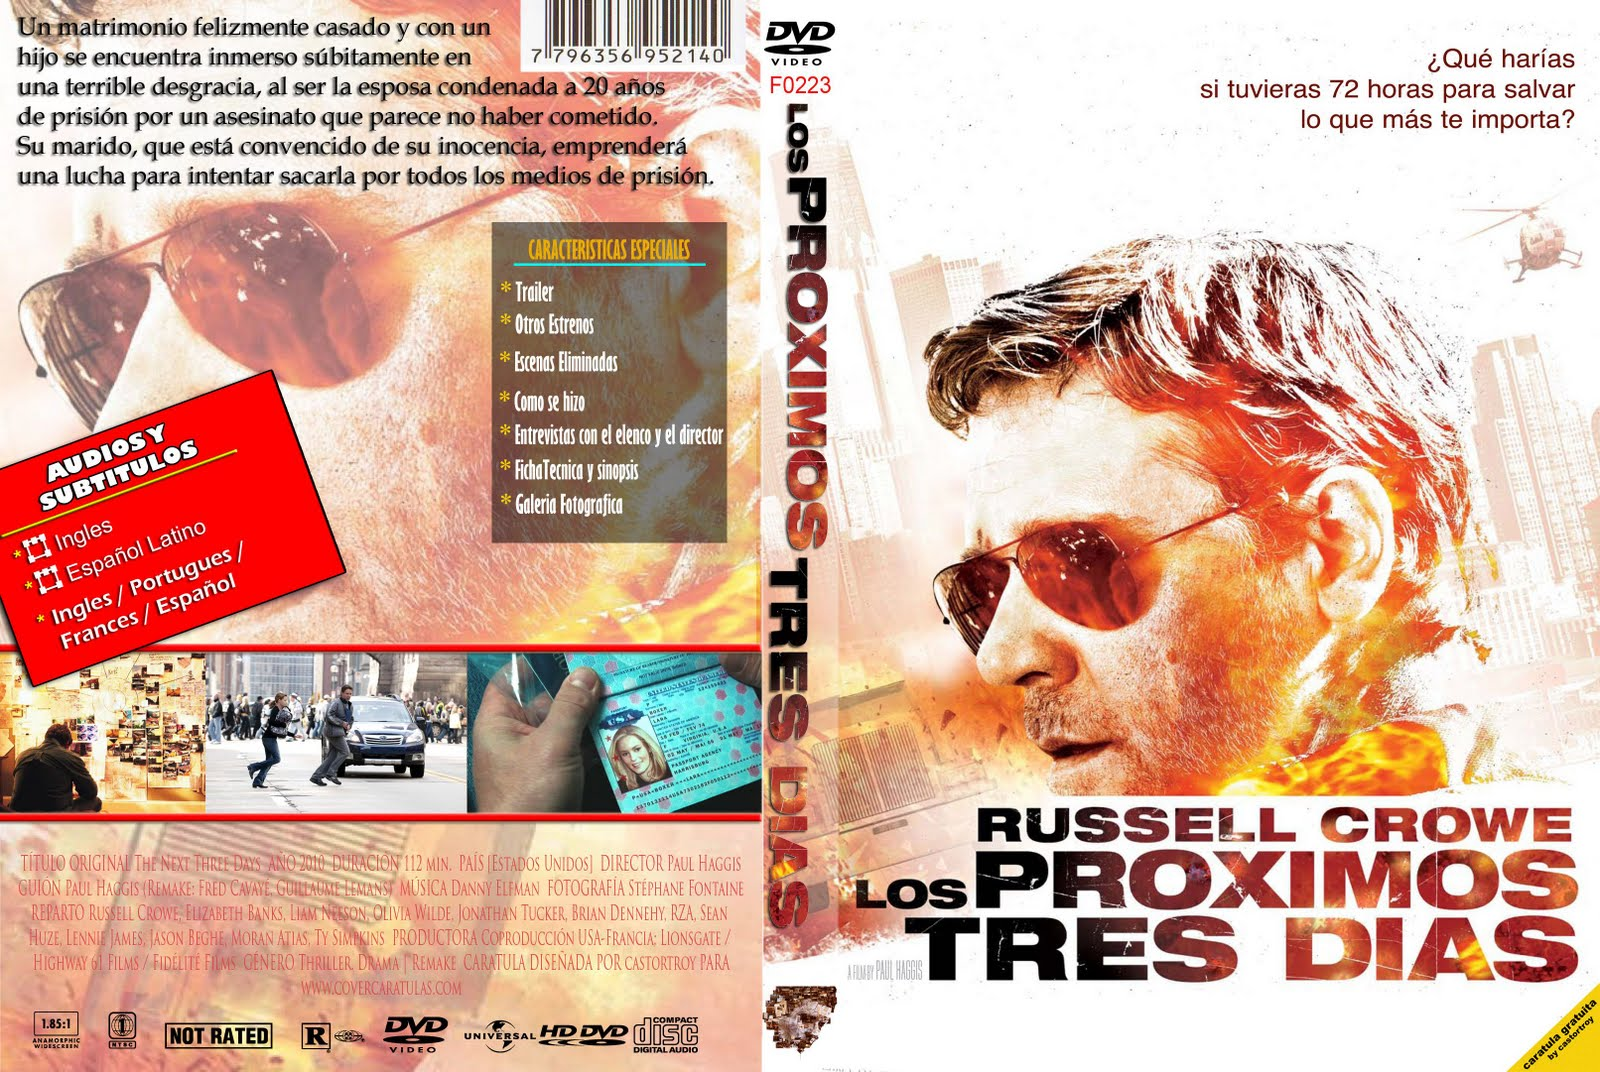 http://4.bp.blogspot.com/-VCx1XRMmeMA/TYiFWfjoy_I/AAAAAAAADMs/4tYcjq70QD0/s1600/Los_Proximos_Tres_Dias_-_Custom_-_V2_por_castortroy2_[dvd]_80.jpg